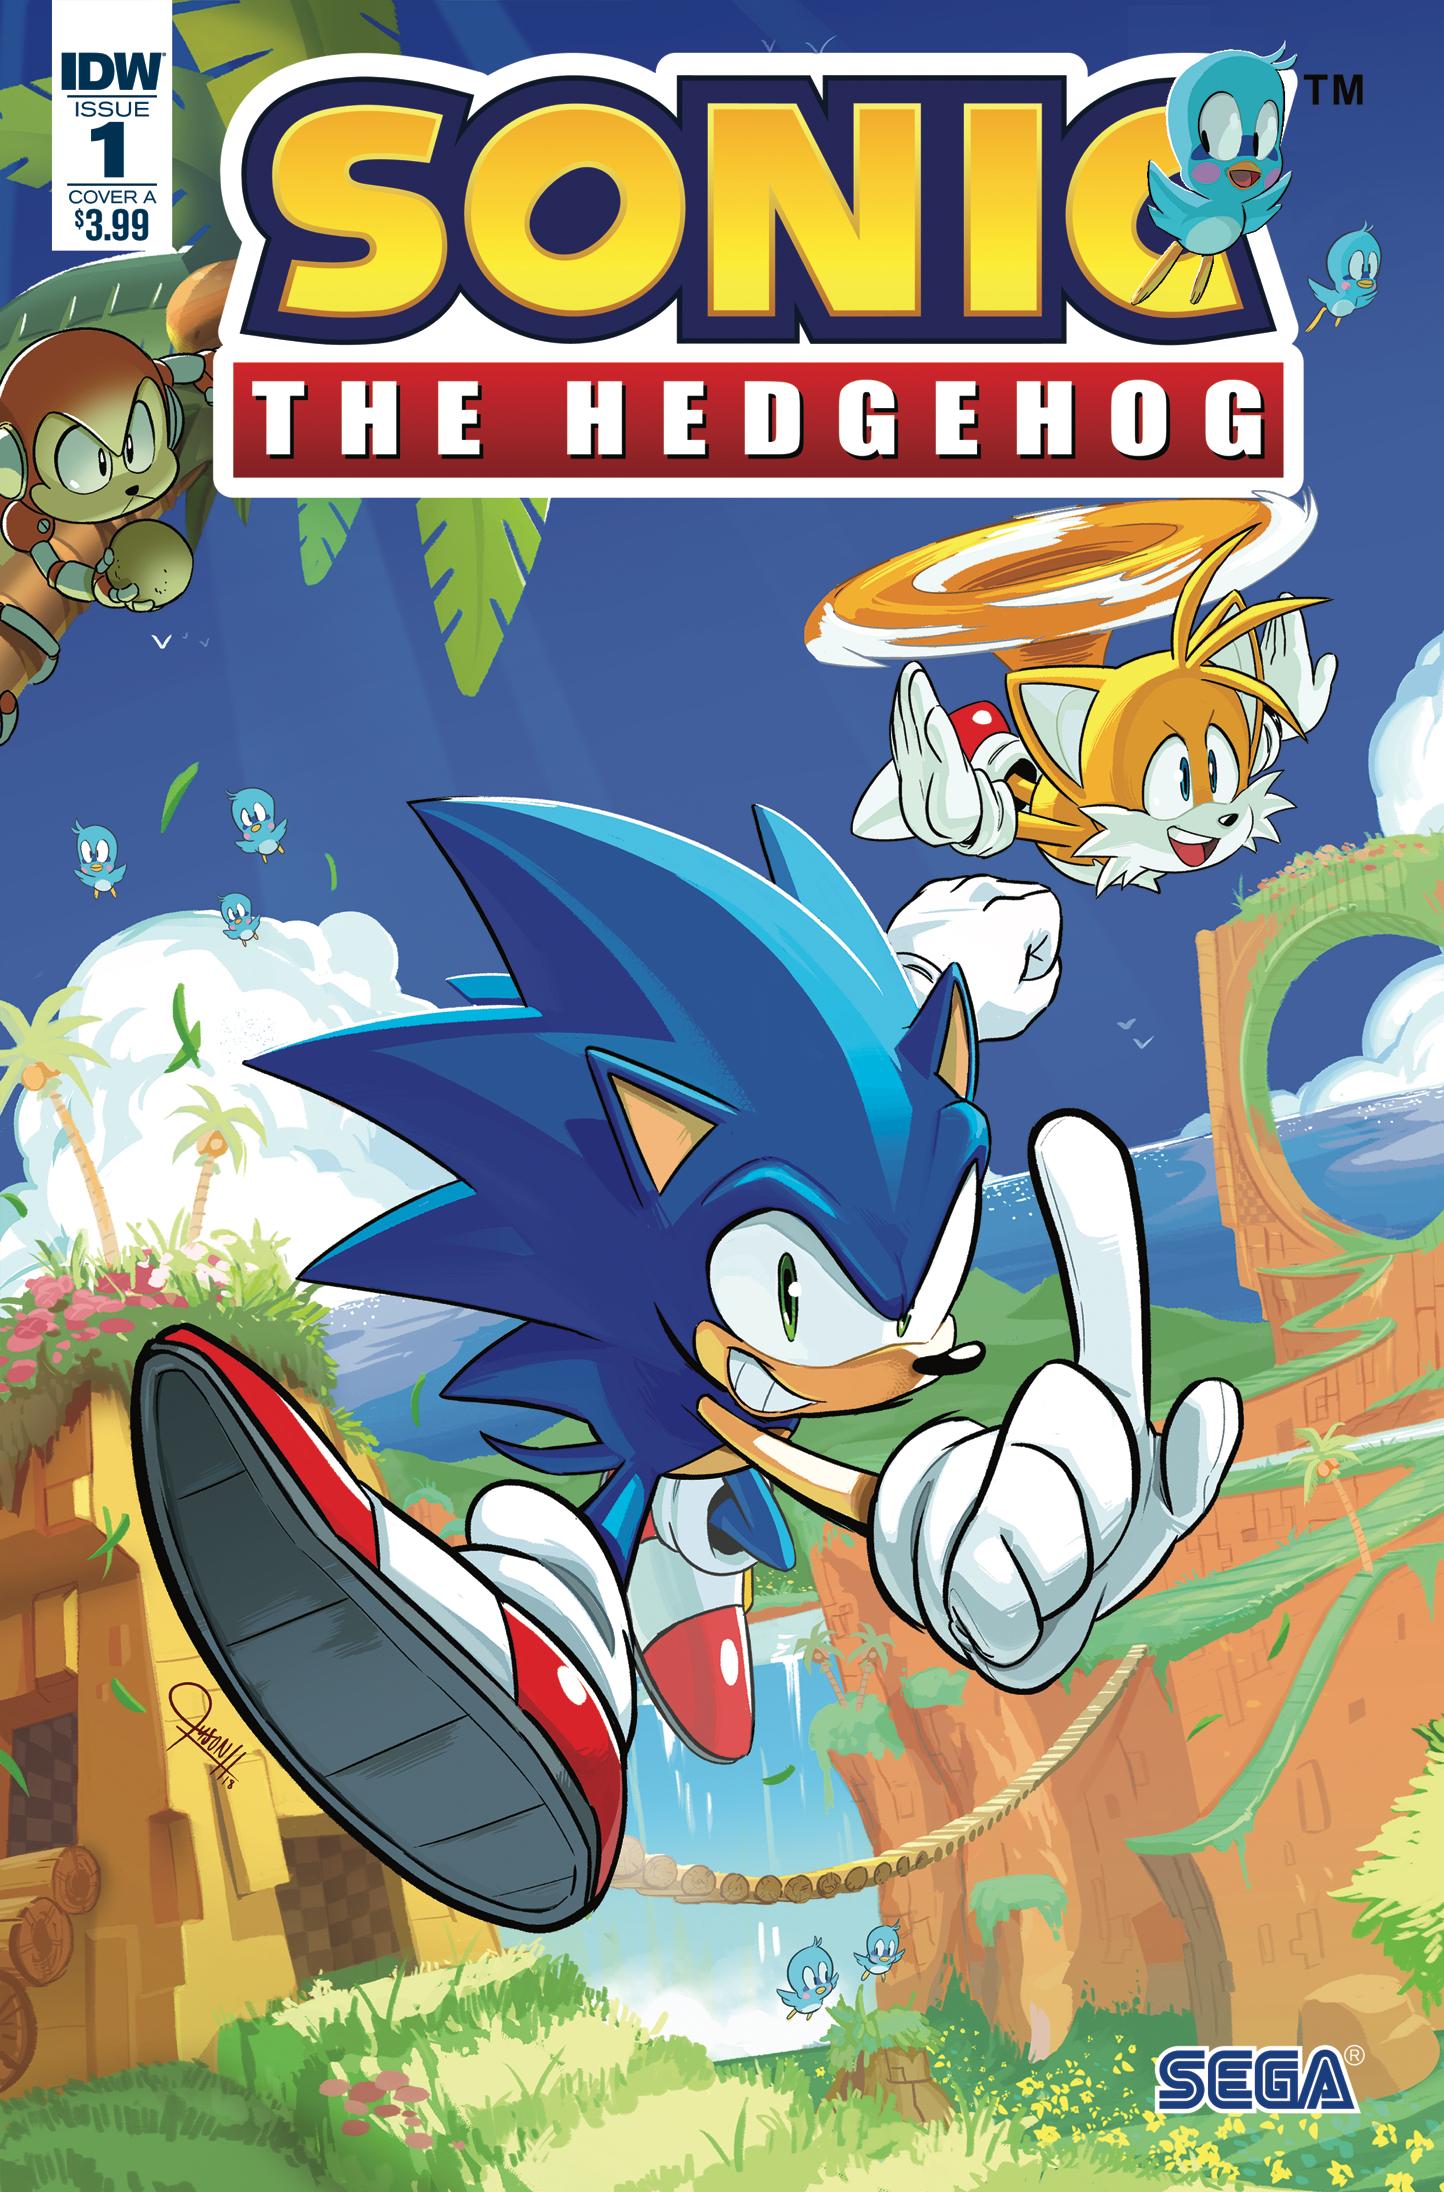 idw sonic the hedgehog issue 1 sonic news network fandom powered